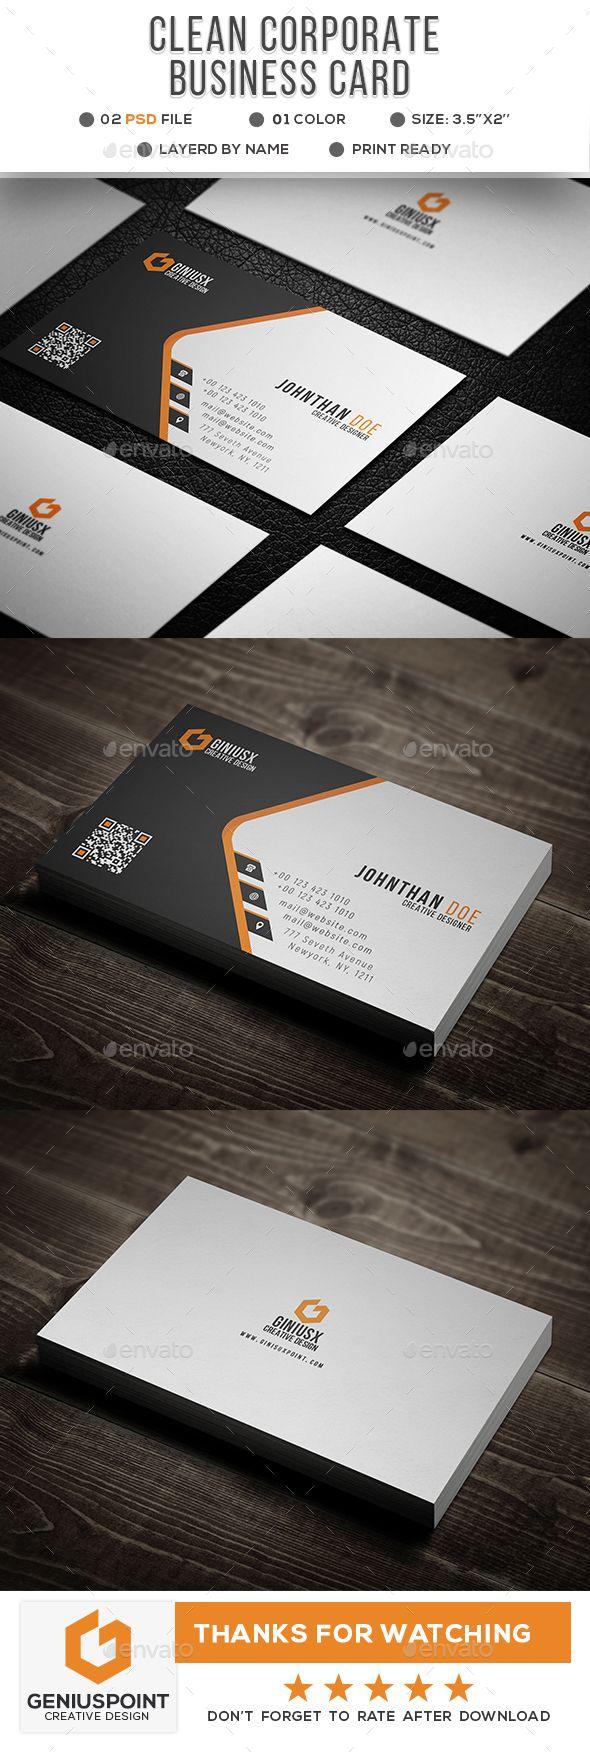 Clean Corporate Business Card Corporate Business Card Minimal Business Card Printing Business Cards